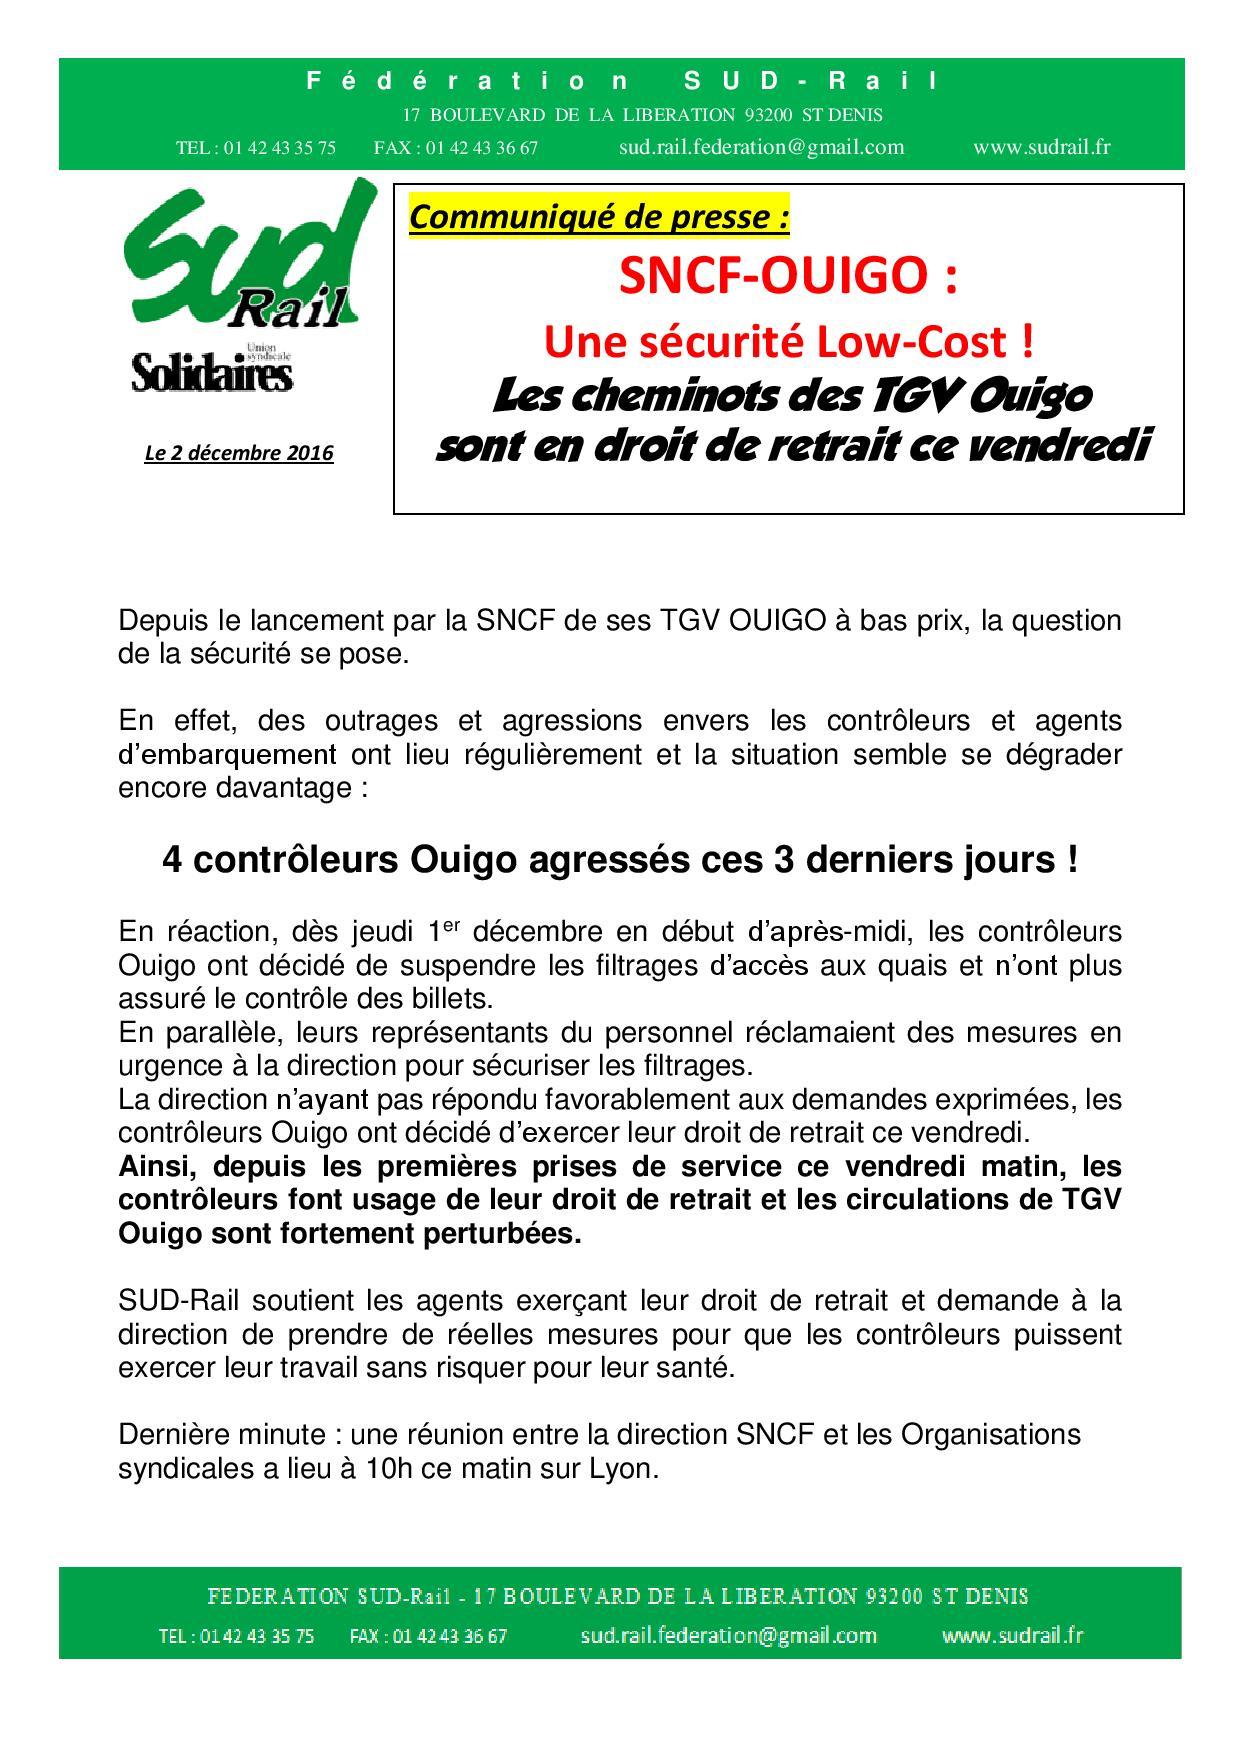 ouigo-securite-lowcost-page-001